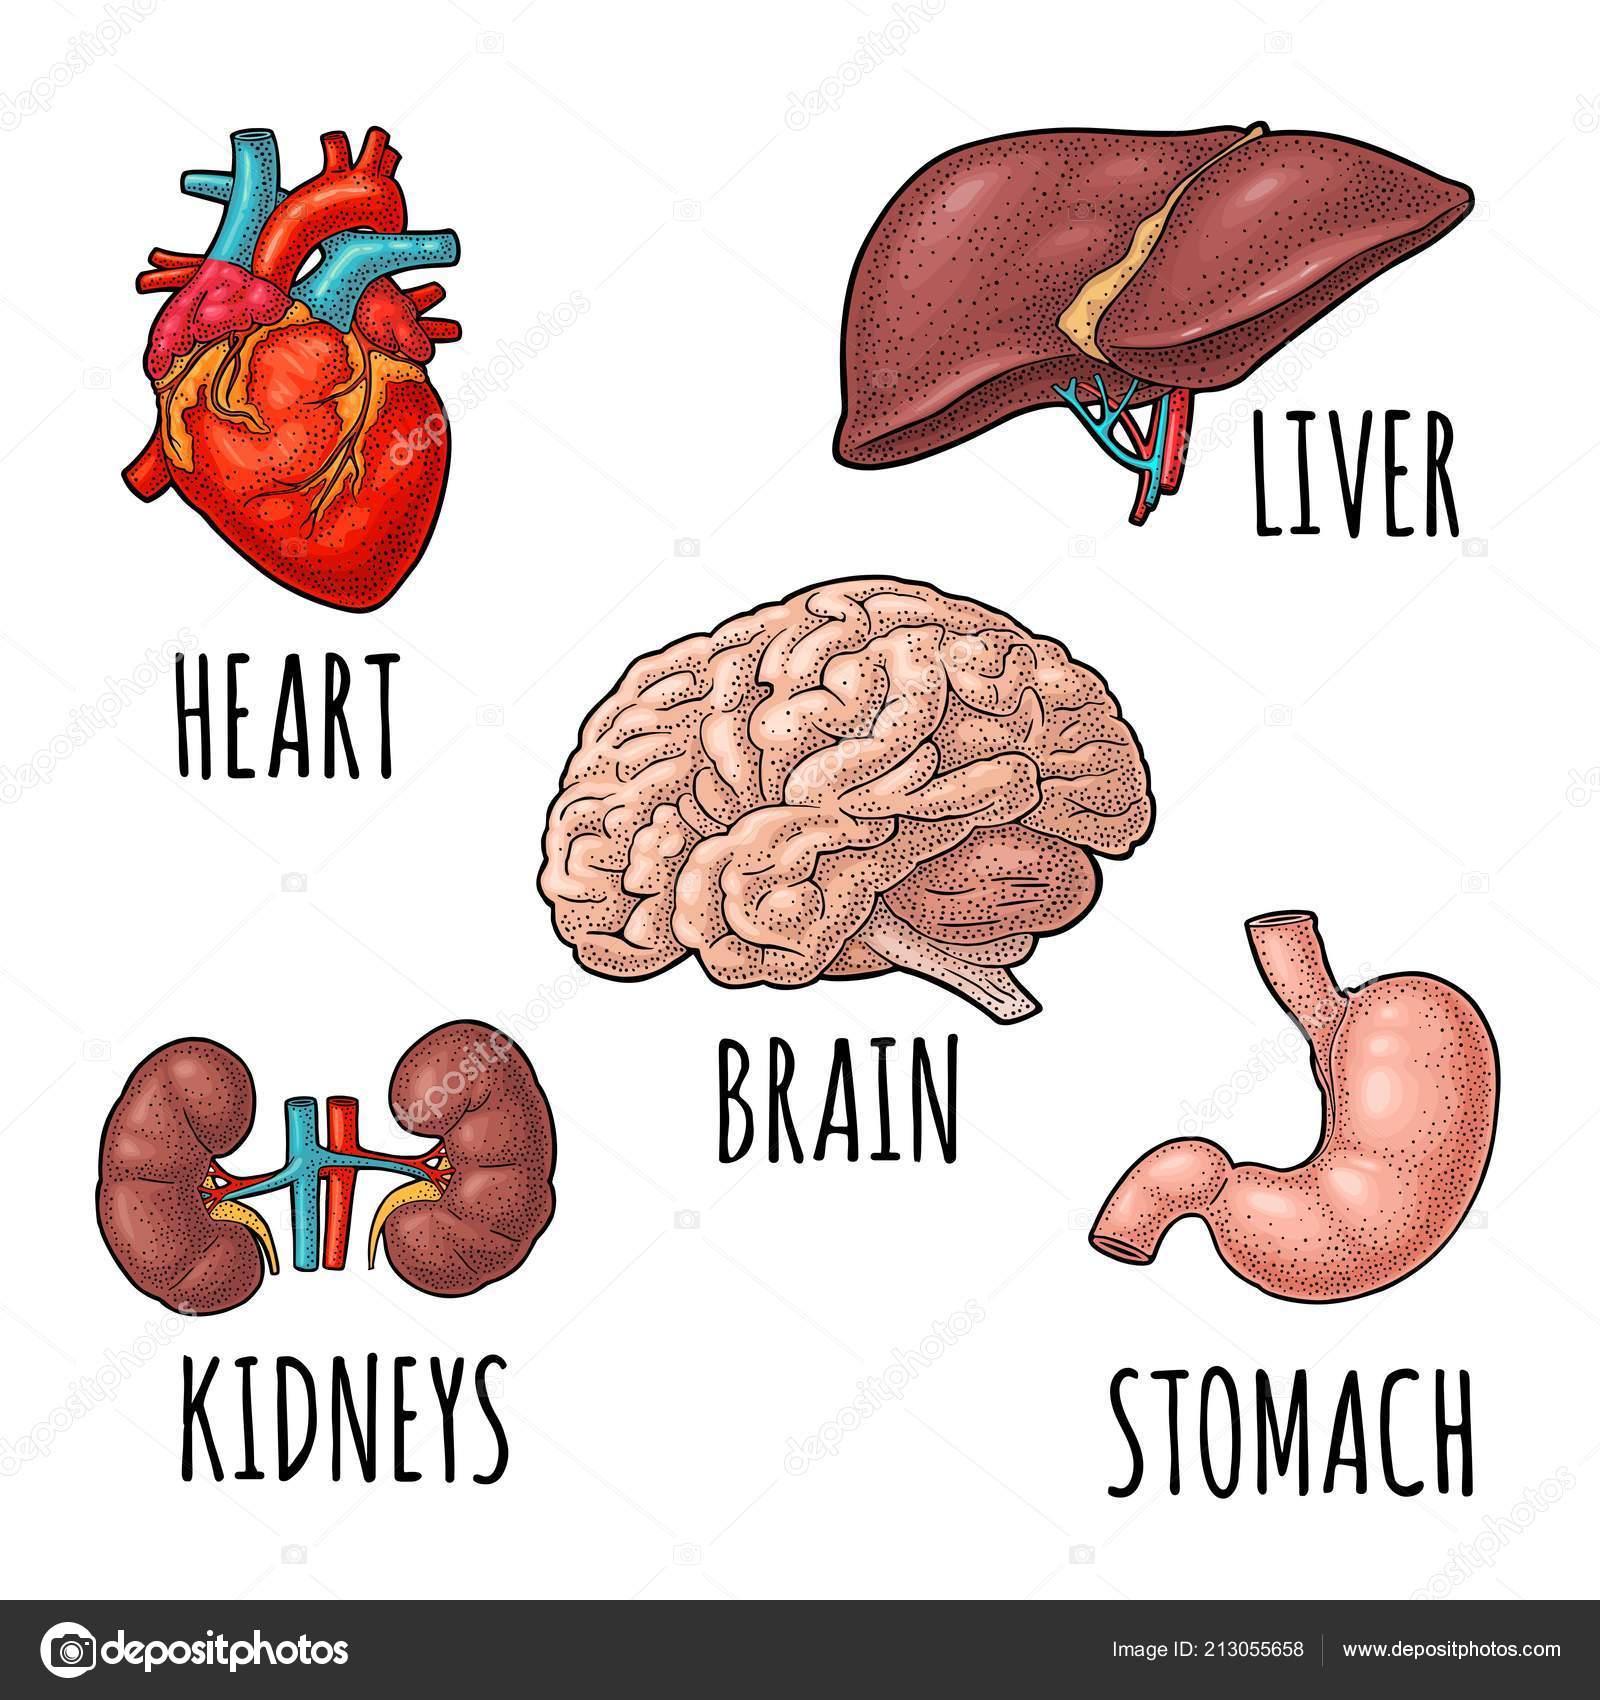 Human Anatomy Organs Brain Kidney Heart Liver Stomach Vector Color